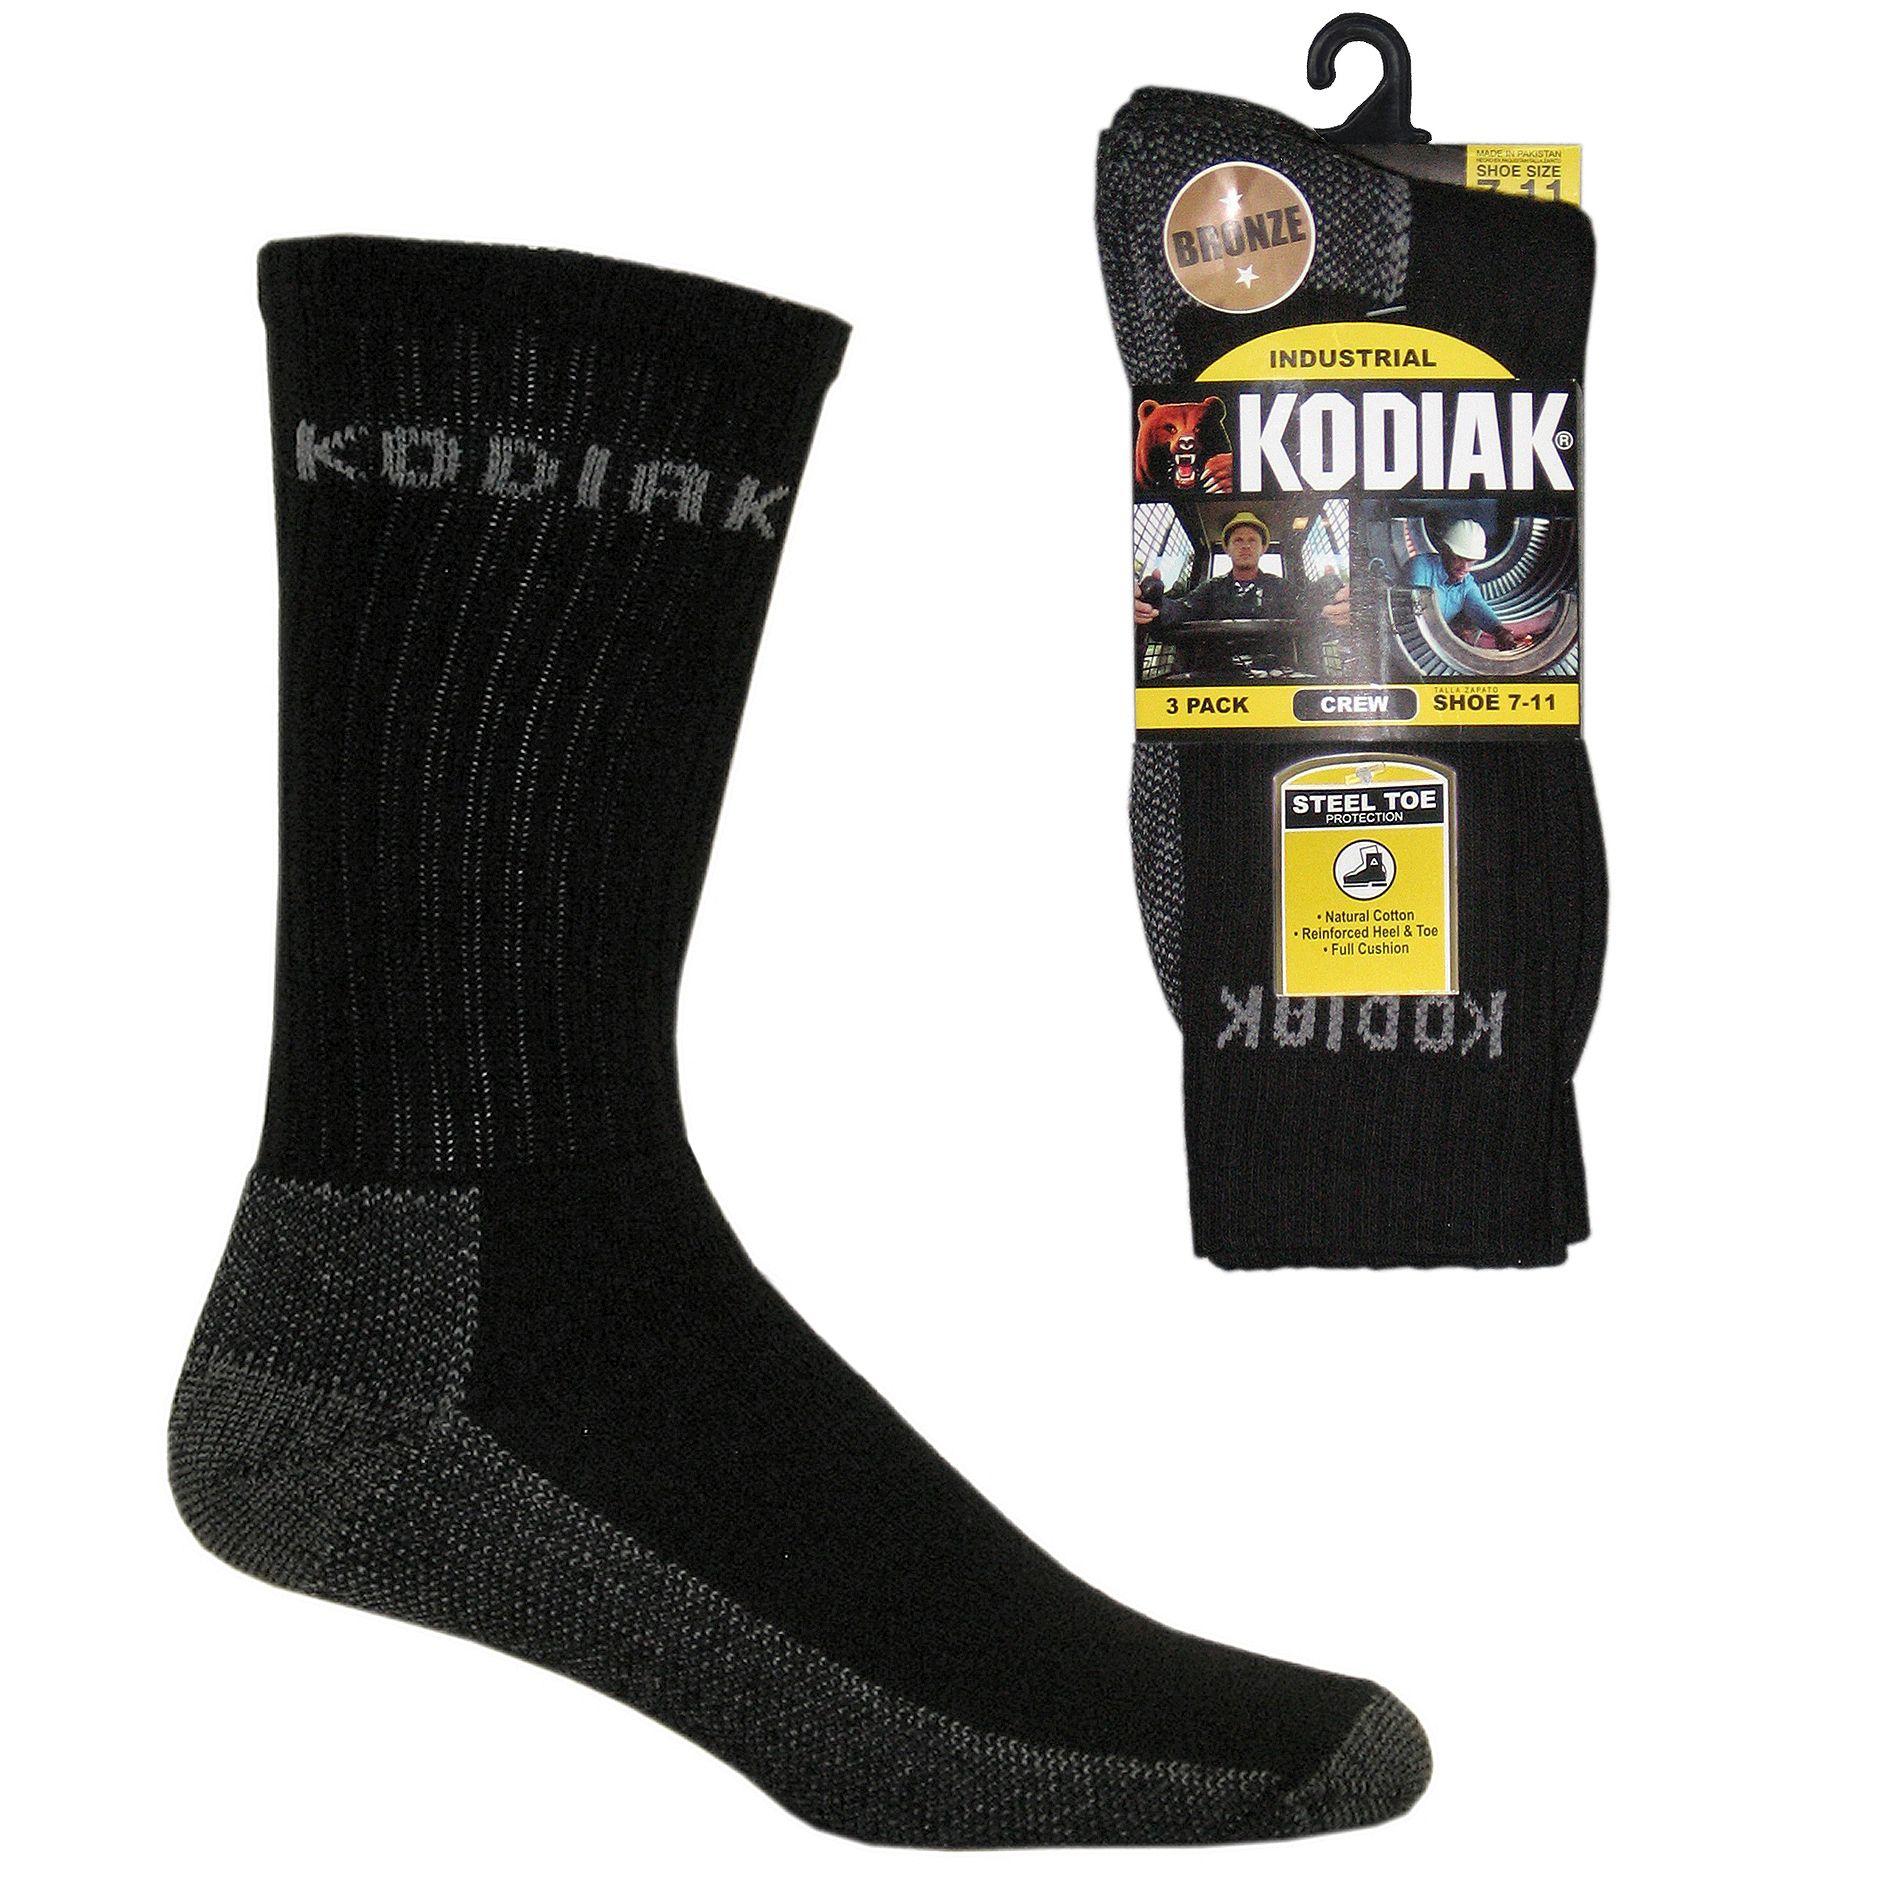 Men's Steel Toe Protection Crew Sock - 3 Pair Pack